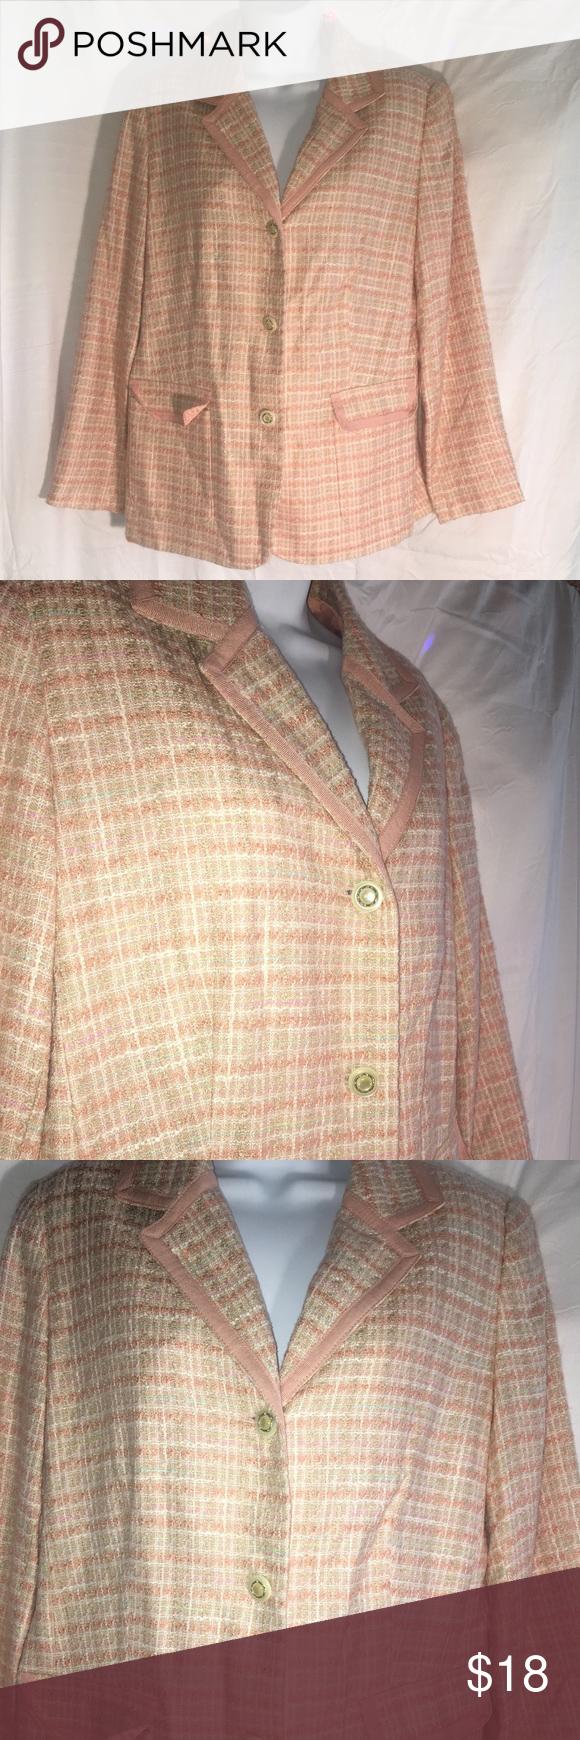 Jaclyn Smith Woman's Blazer Jaclyn Smith Woman's Blazer  Soft pastel colored…